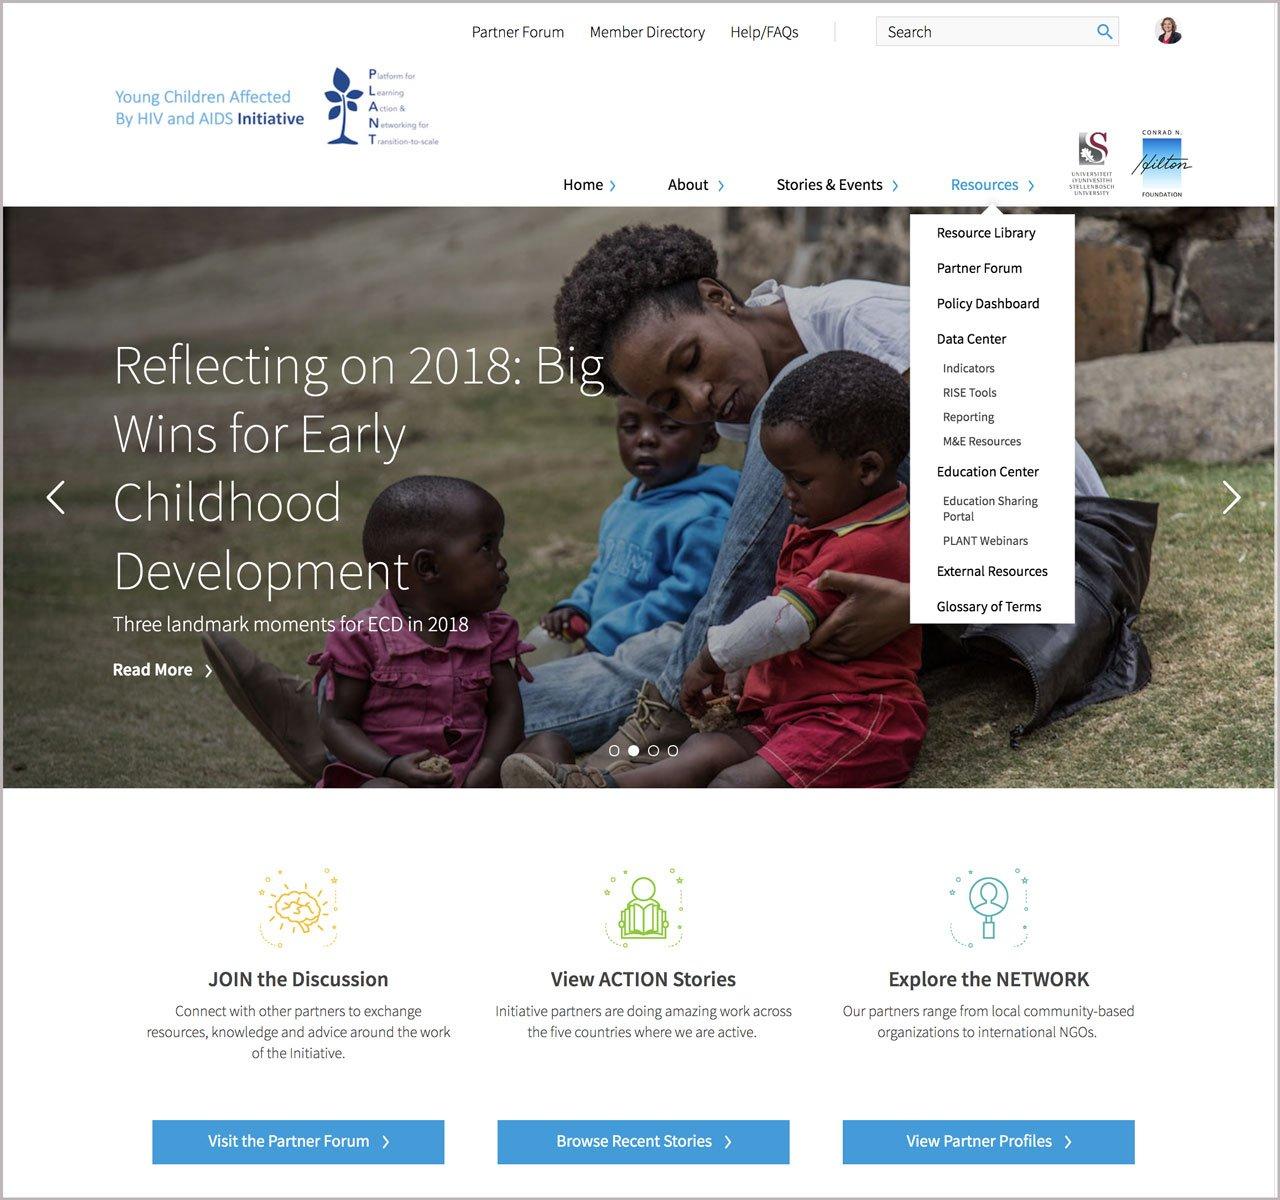 PLANT homepage